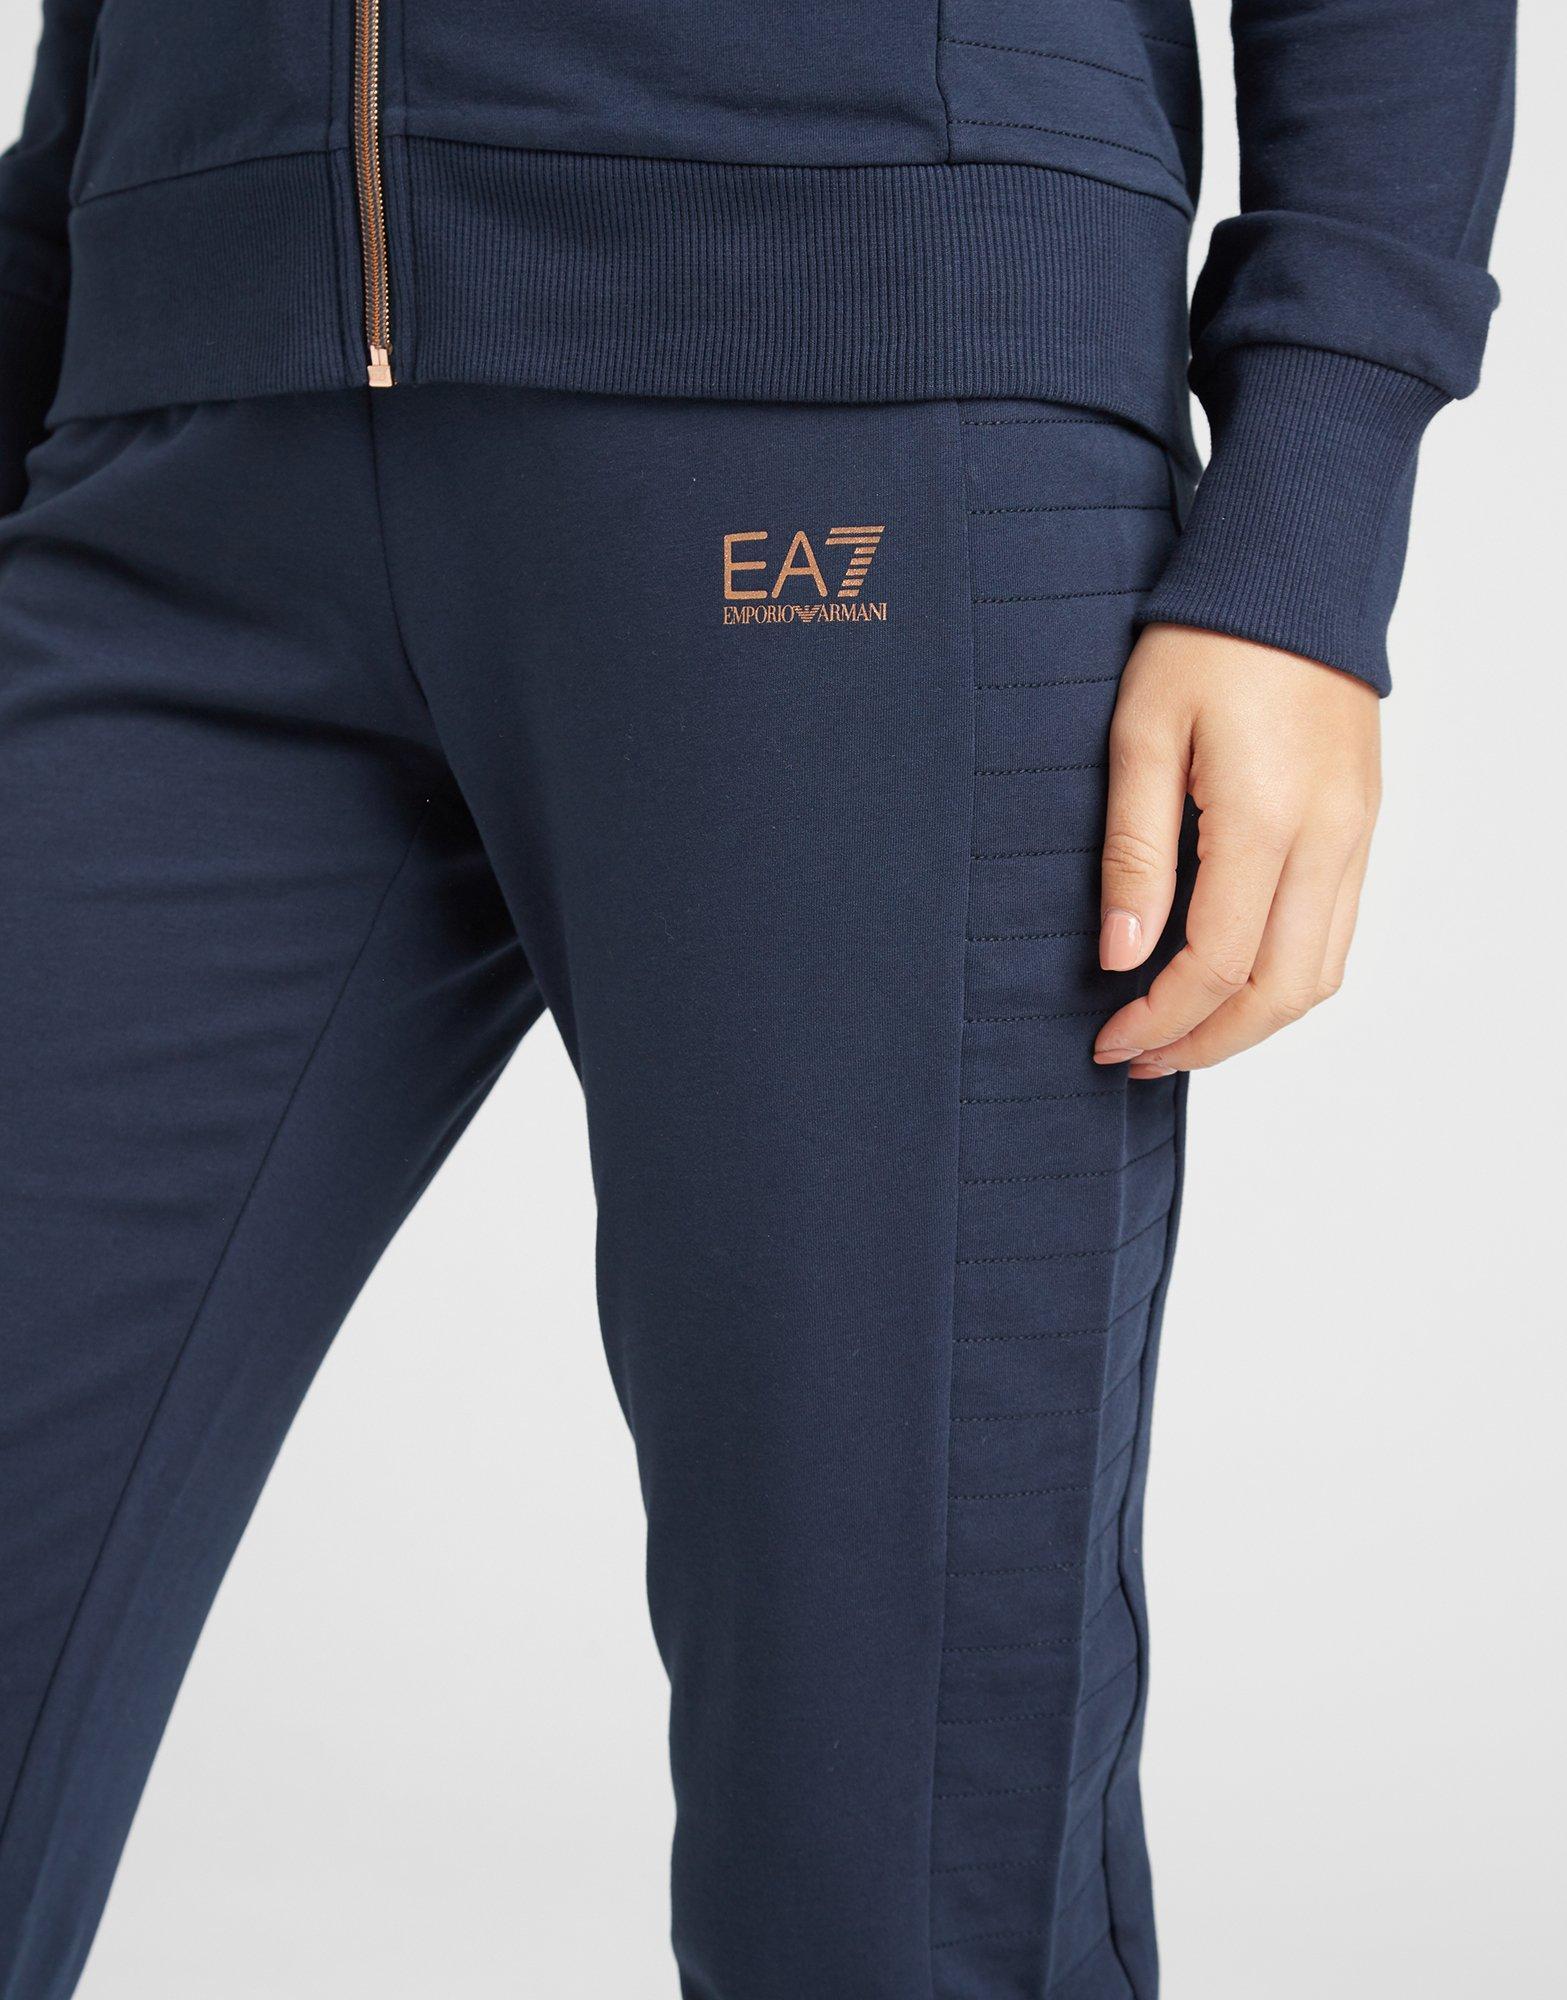 Acheter Bleu Emporio Armani EA7 Survêtement